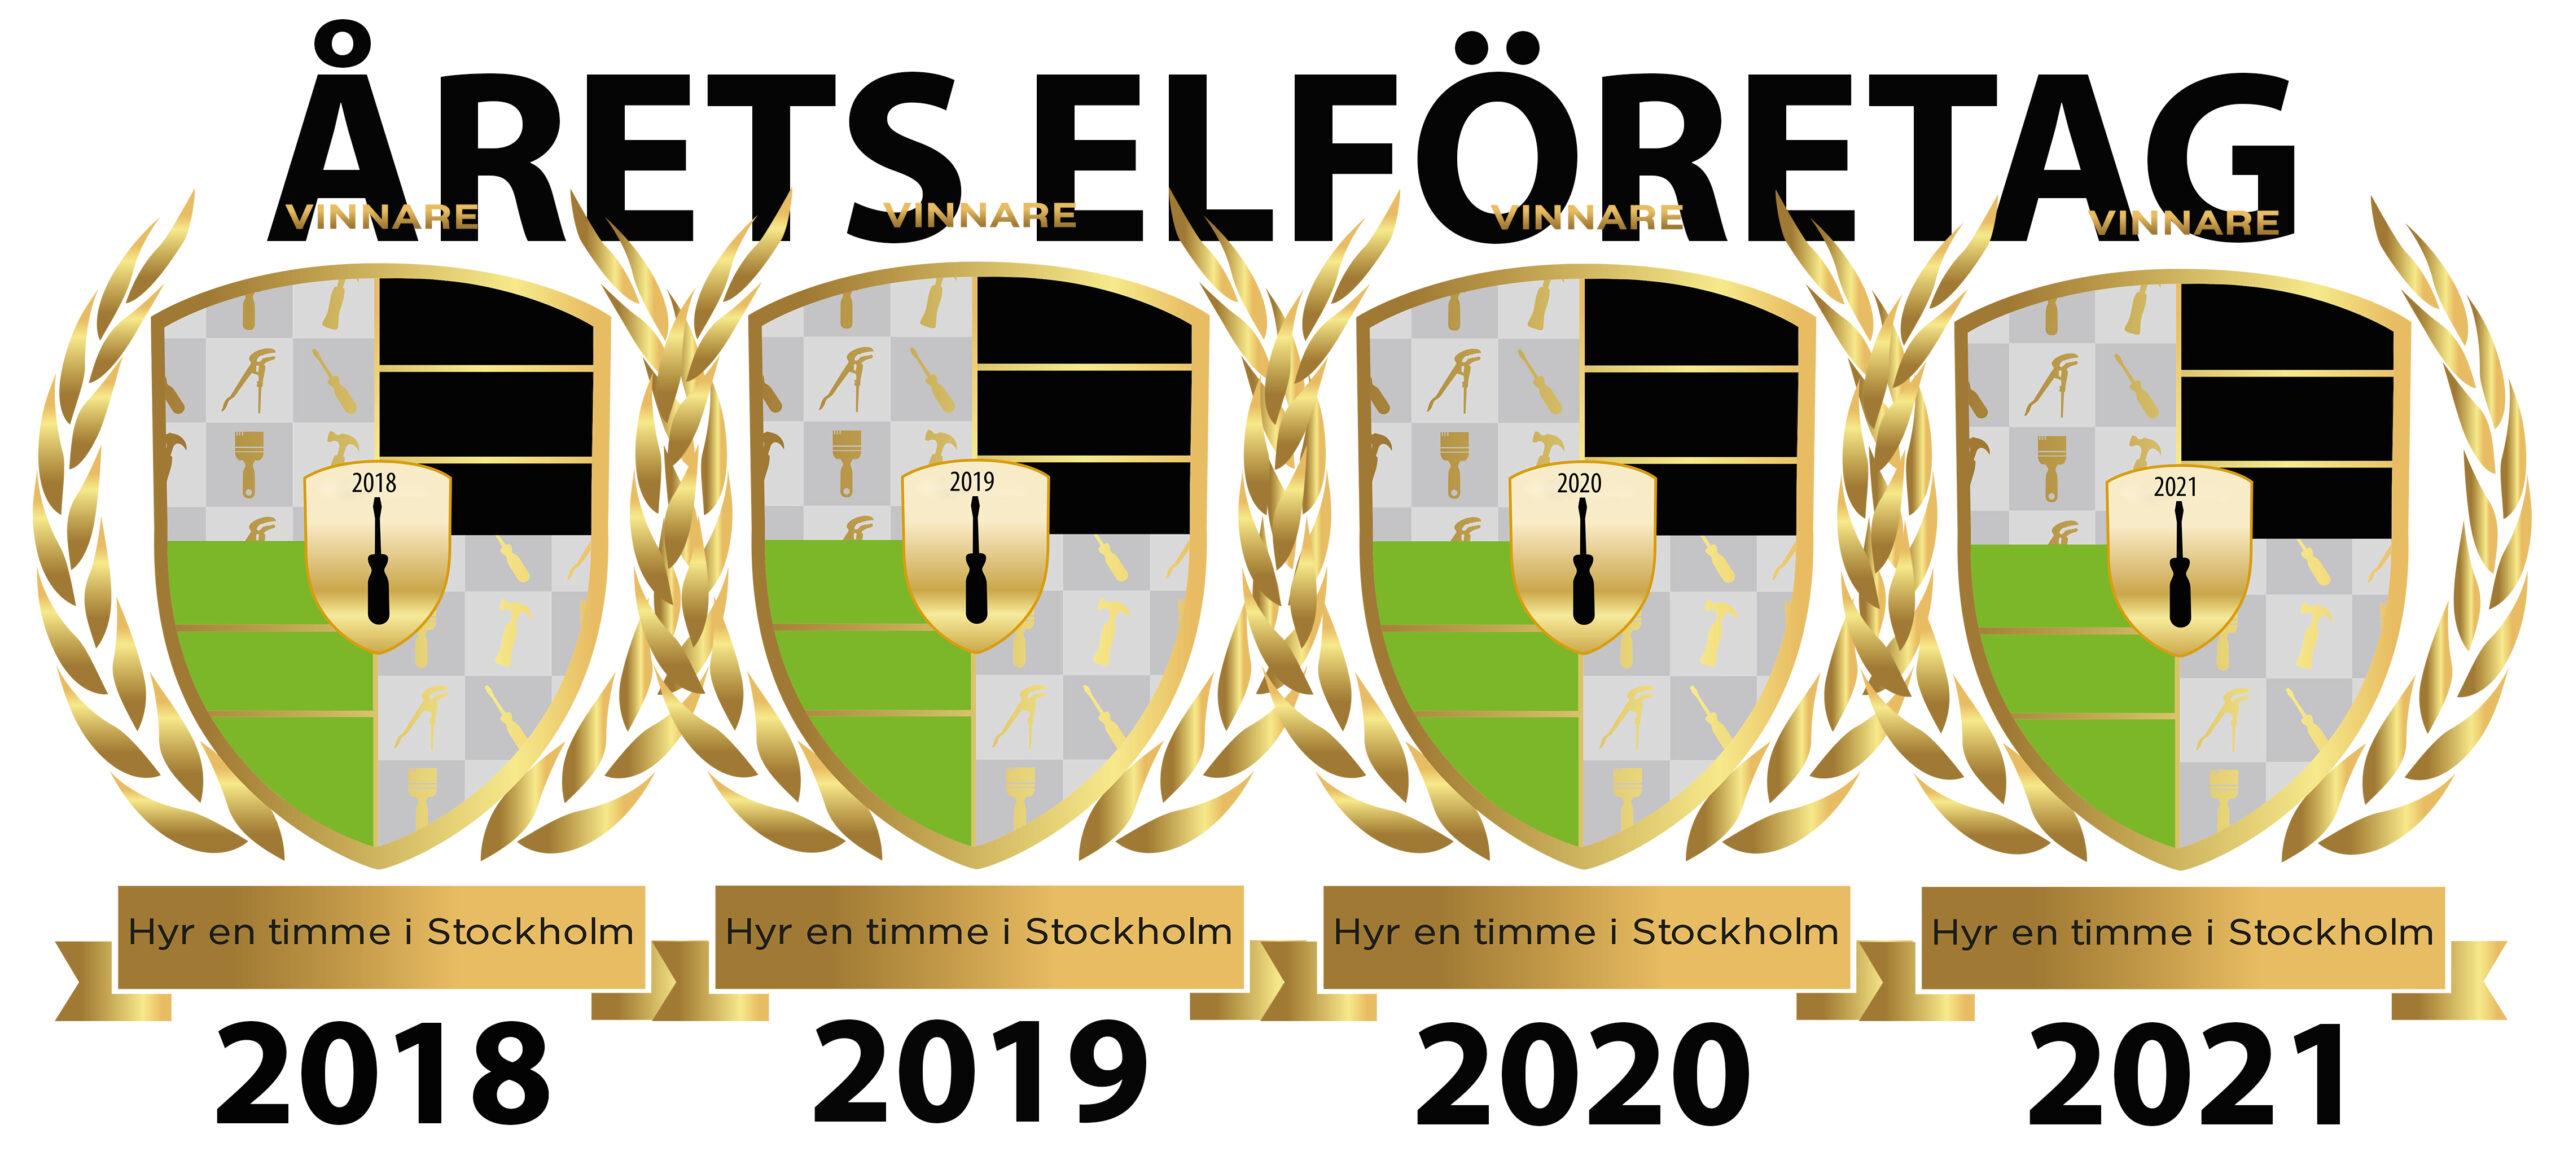 Årets elföretag 2018-2021